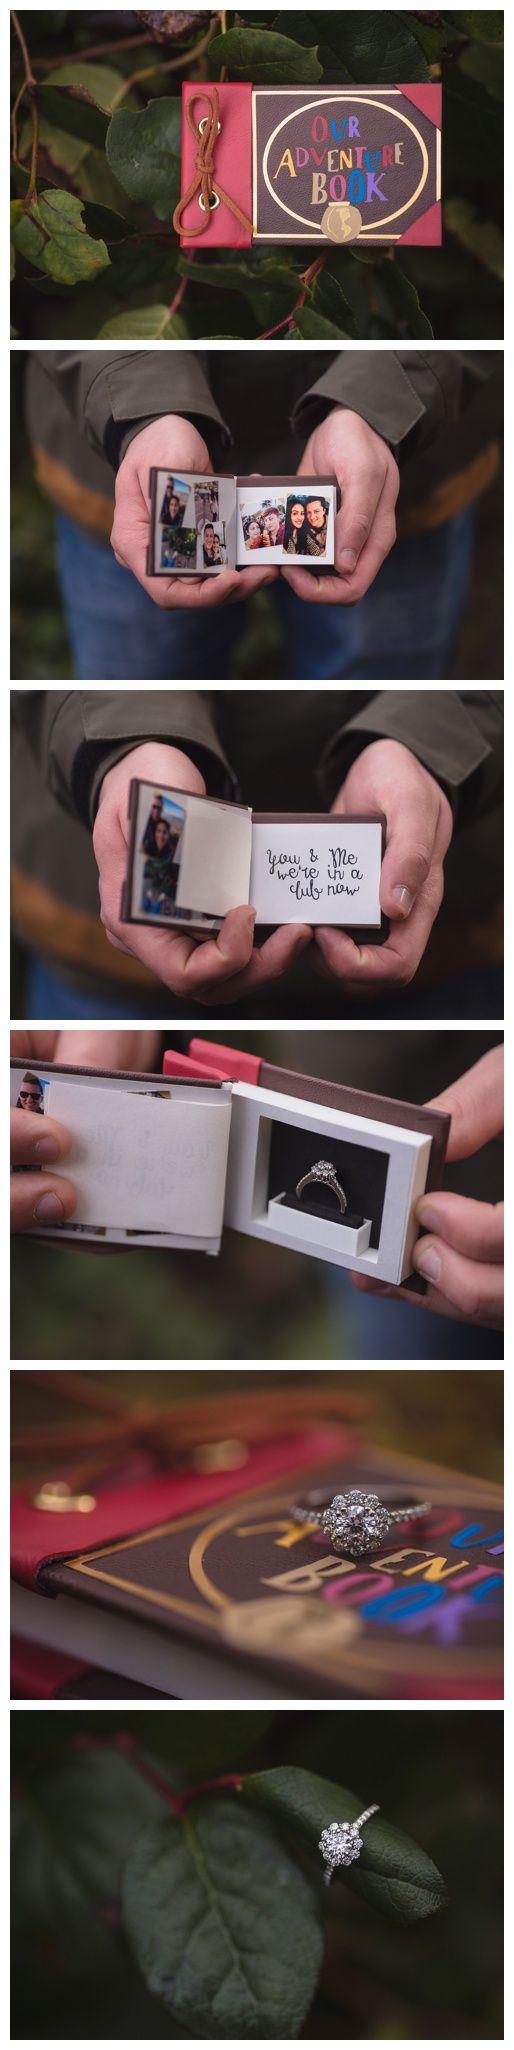 La mejor manera para pedir matrimonio